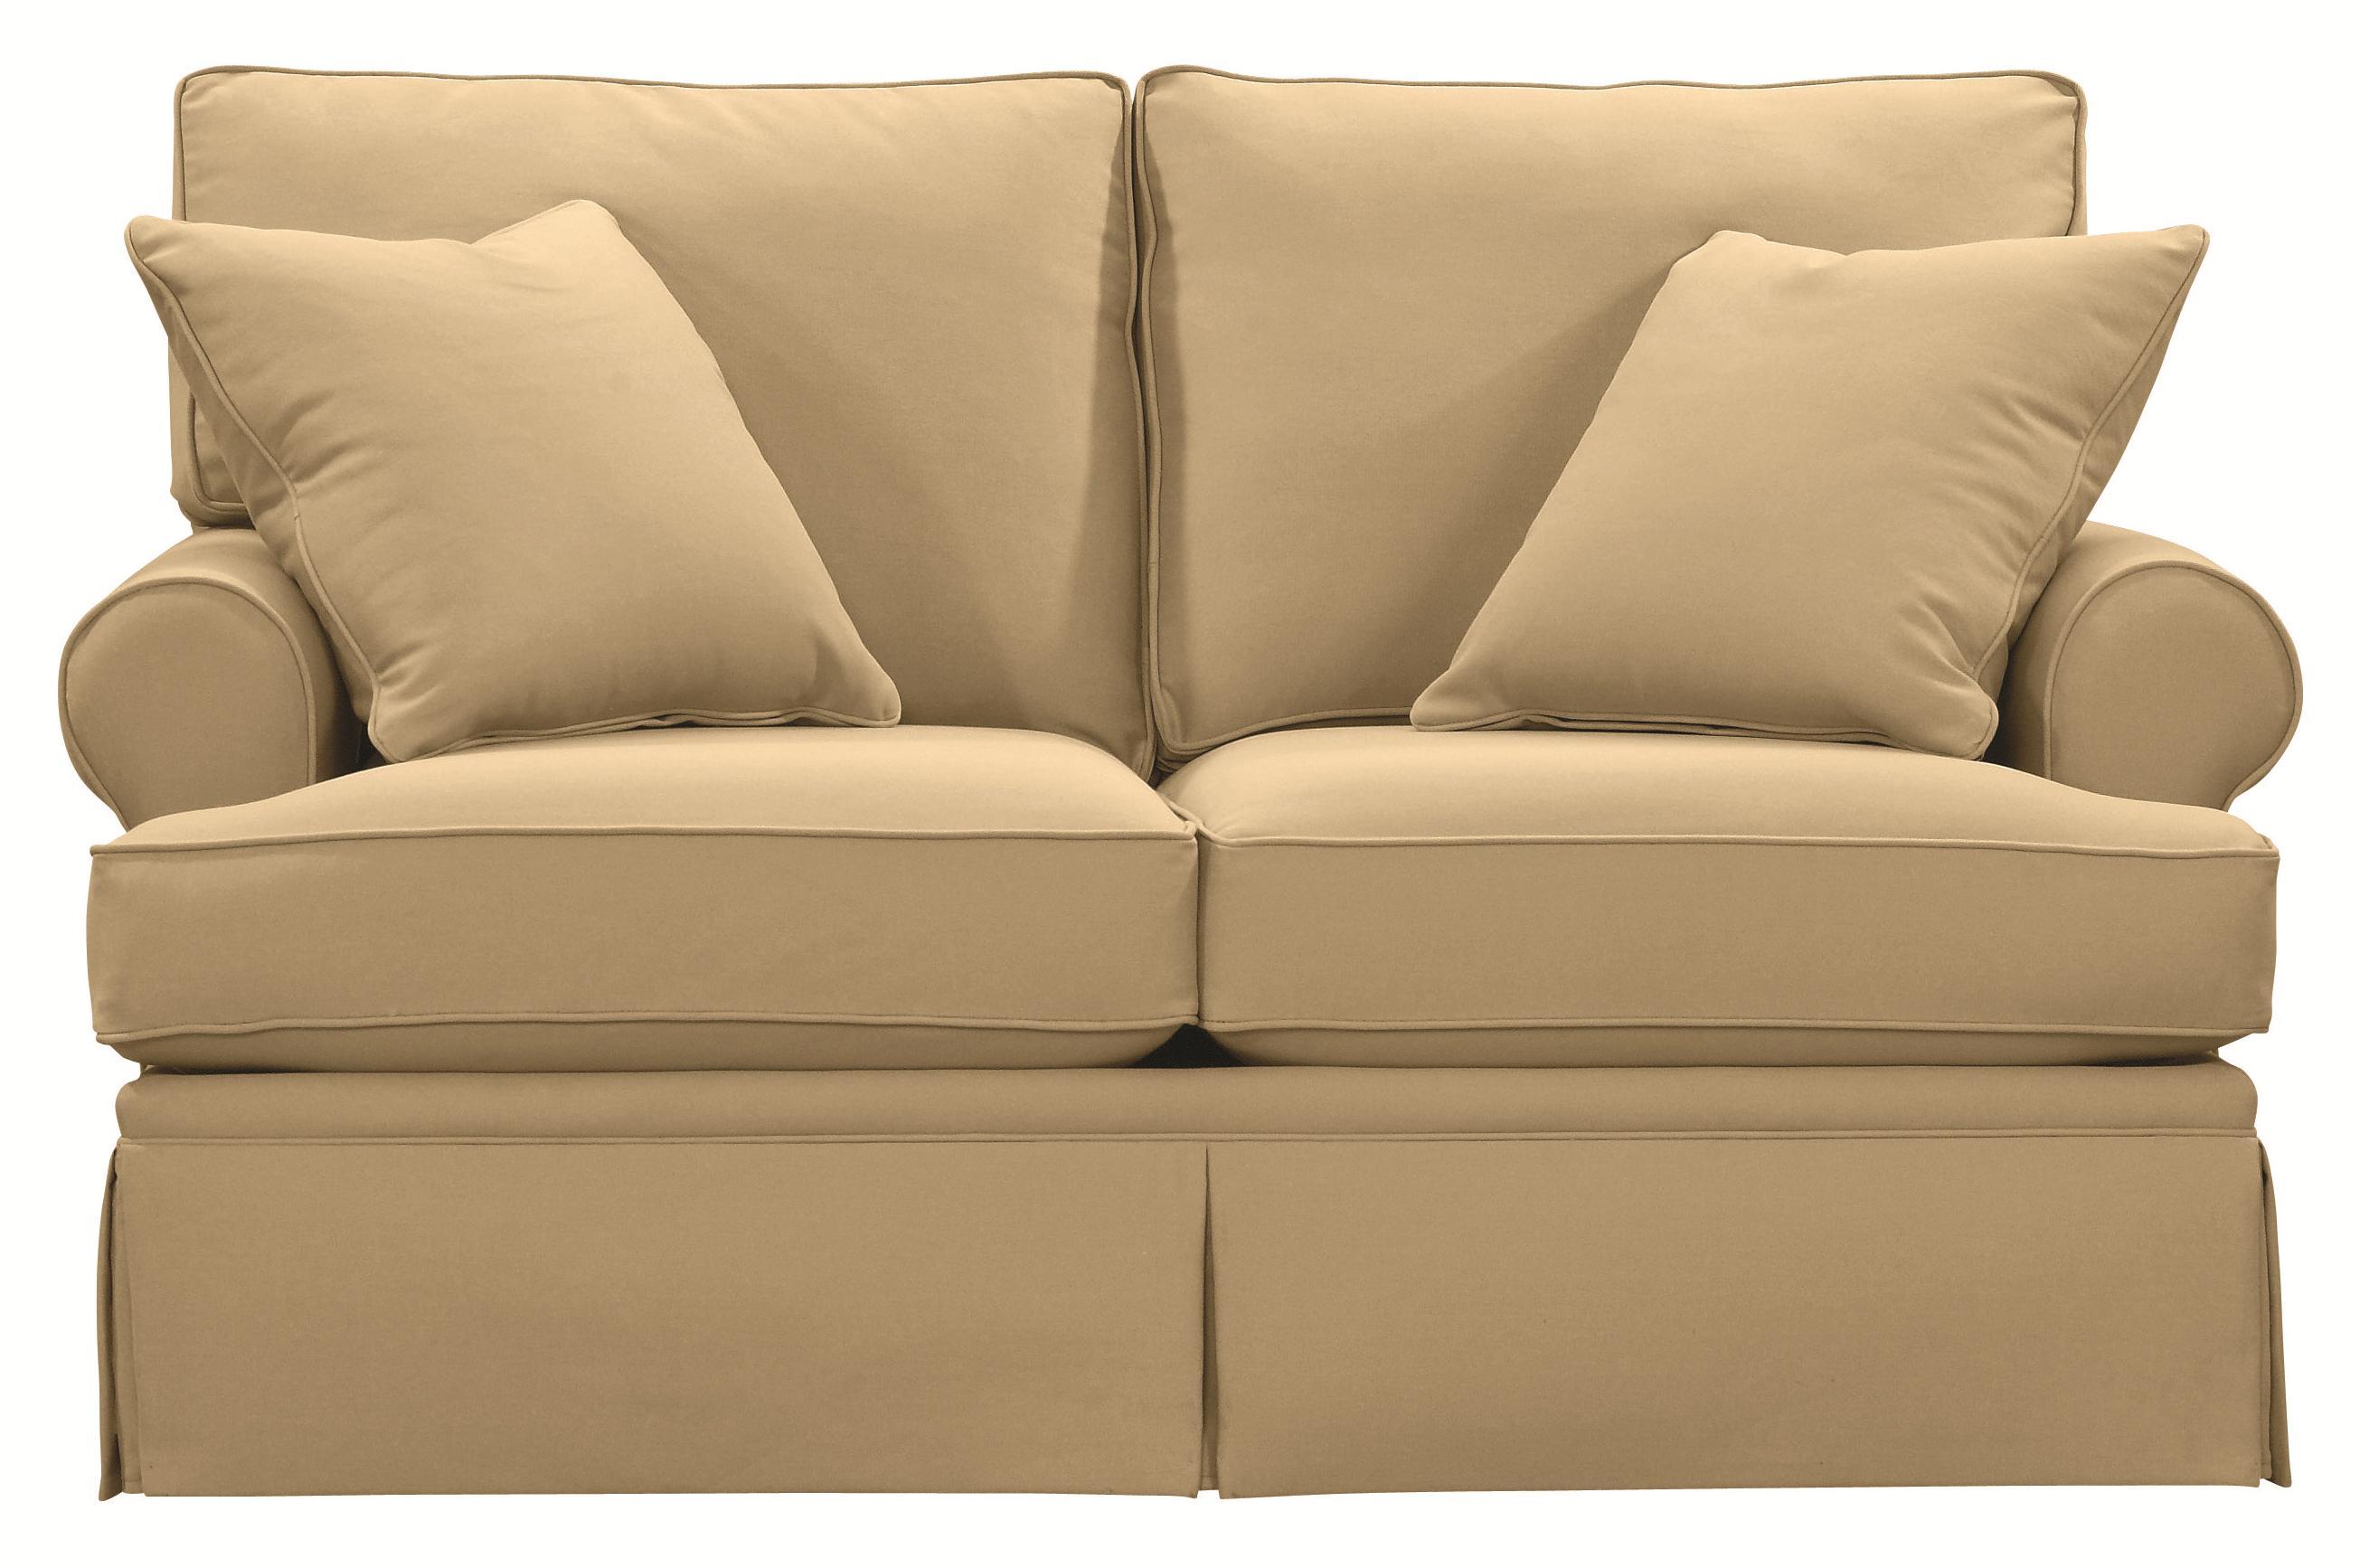 Bassett Custom Upholstery Townhouse B Customizable B Loveseat